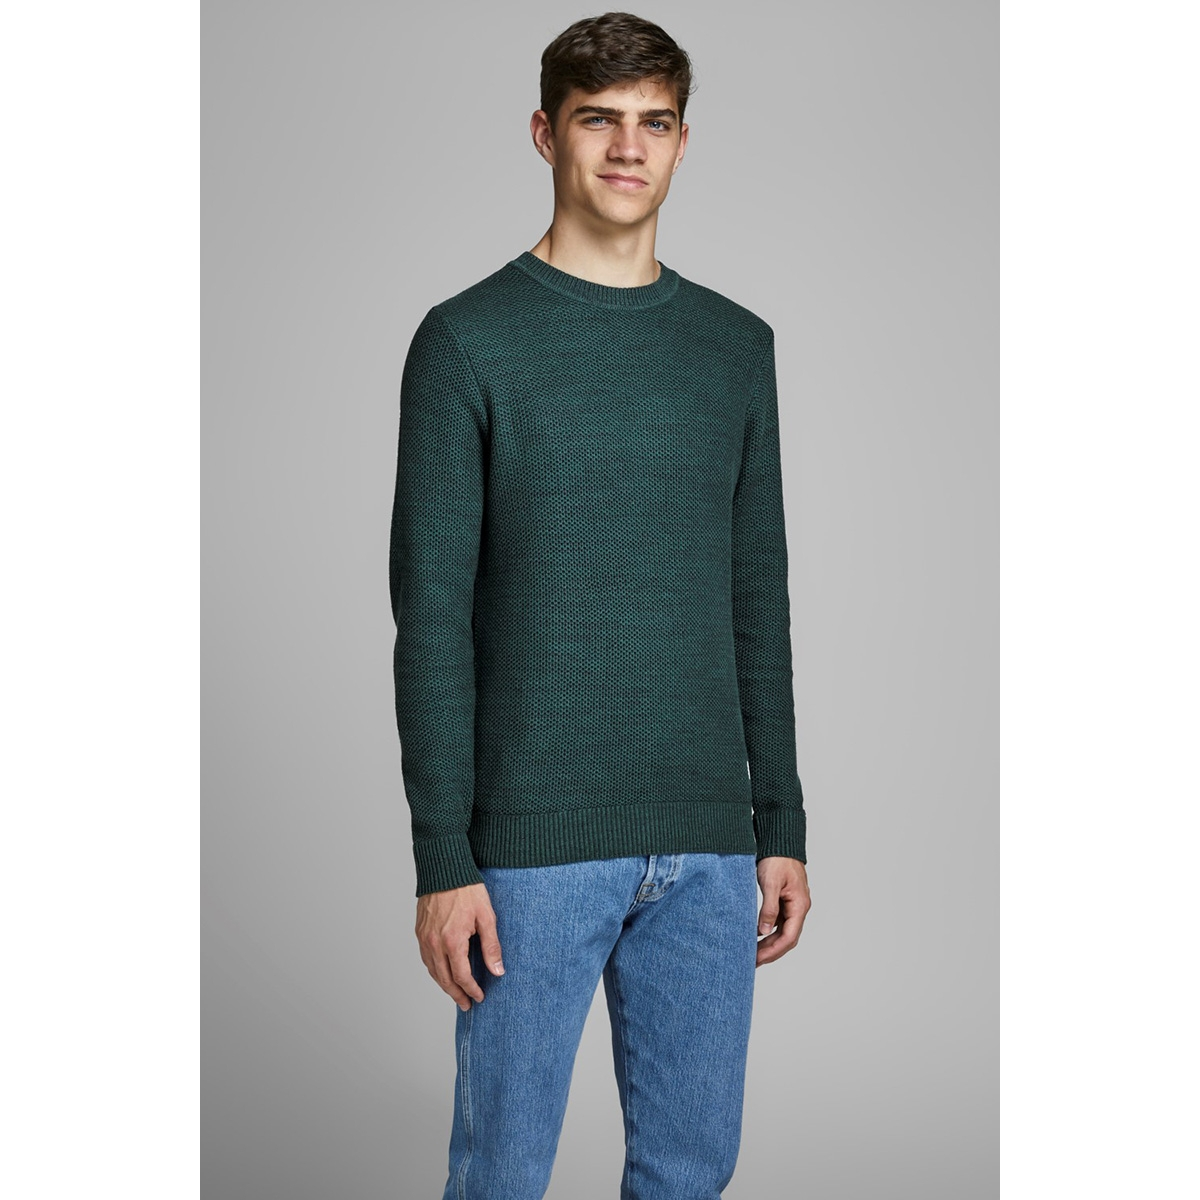 jorfame knit crew neck 12159056 jack & jones trui sea moss/knit fit